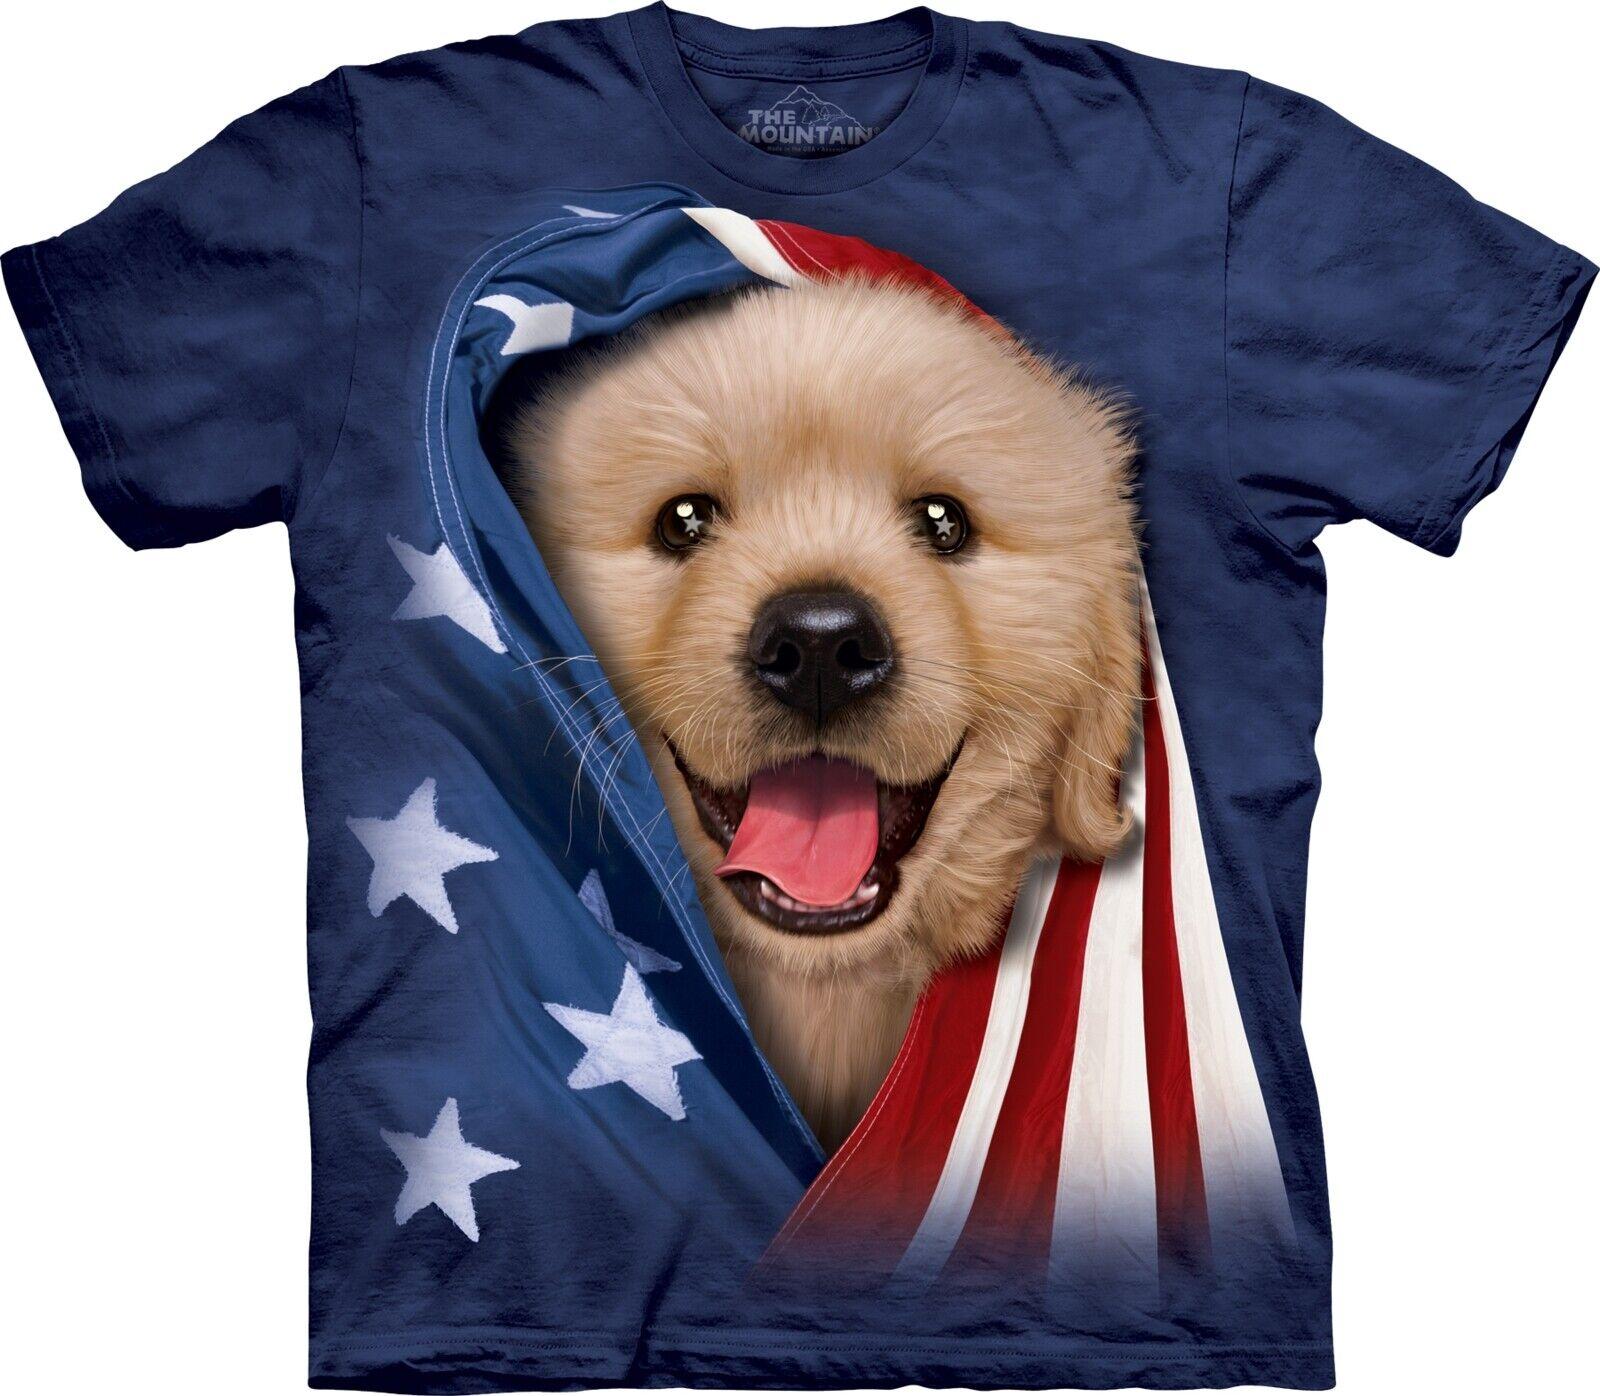 The Mountain Unisex Adult Patriotic Golden Pup Pet T T T Shirt | Nutzen Sie Materialien voll aus  5b2c39